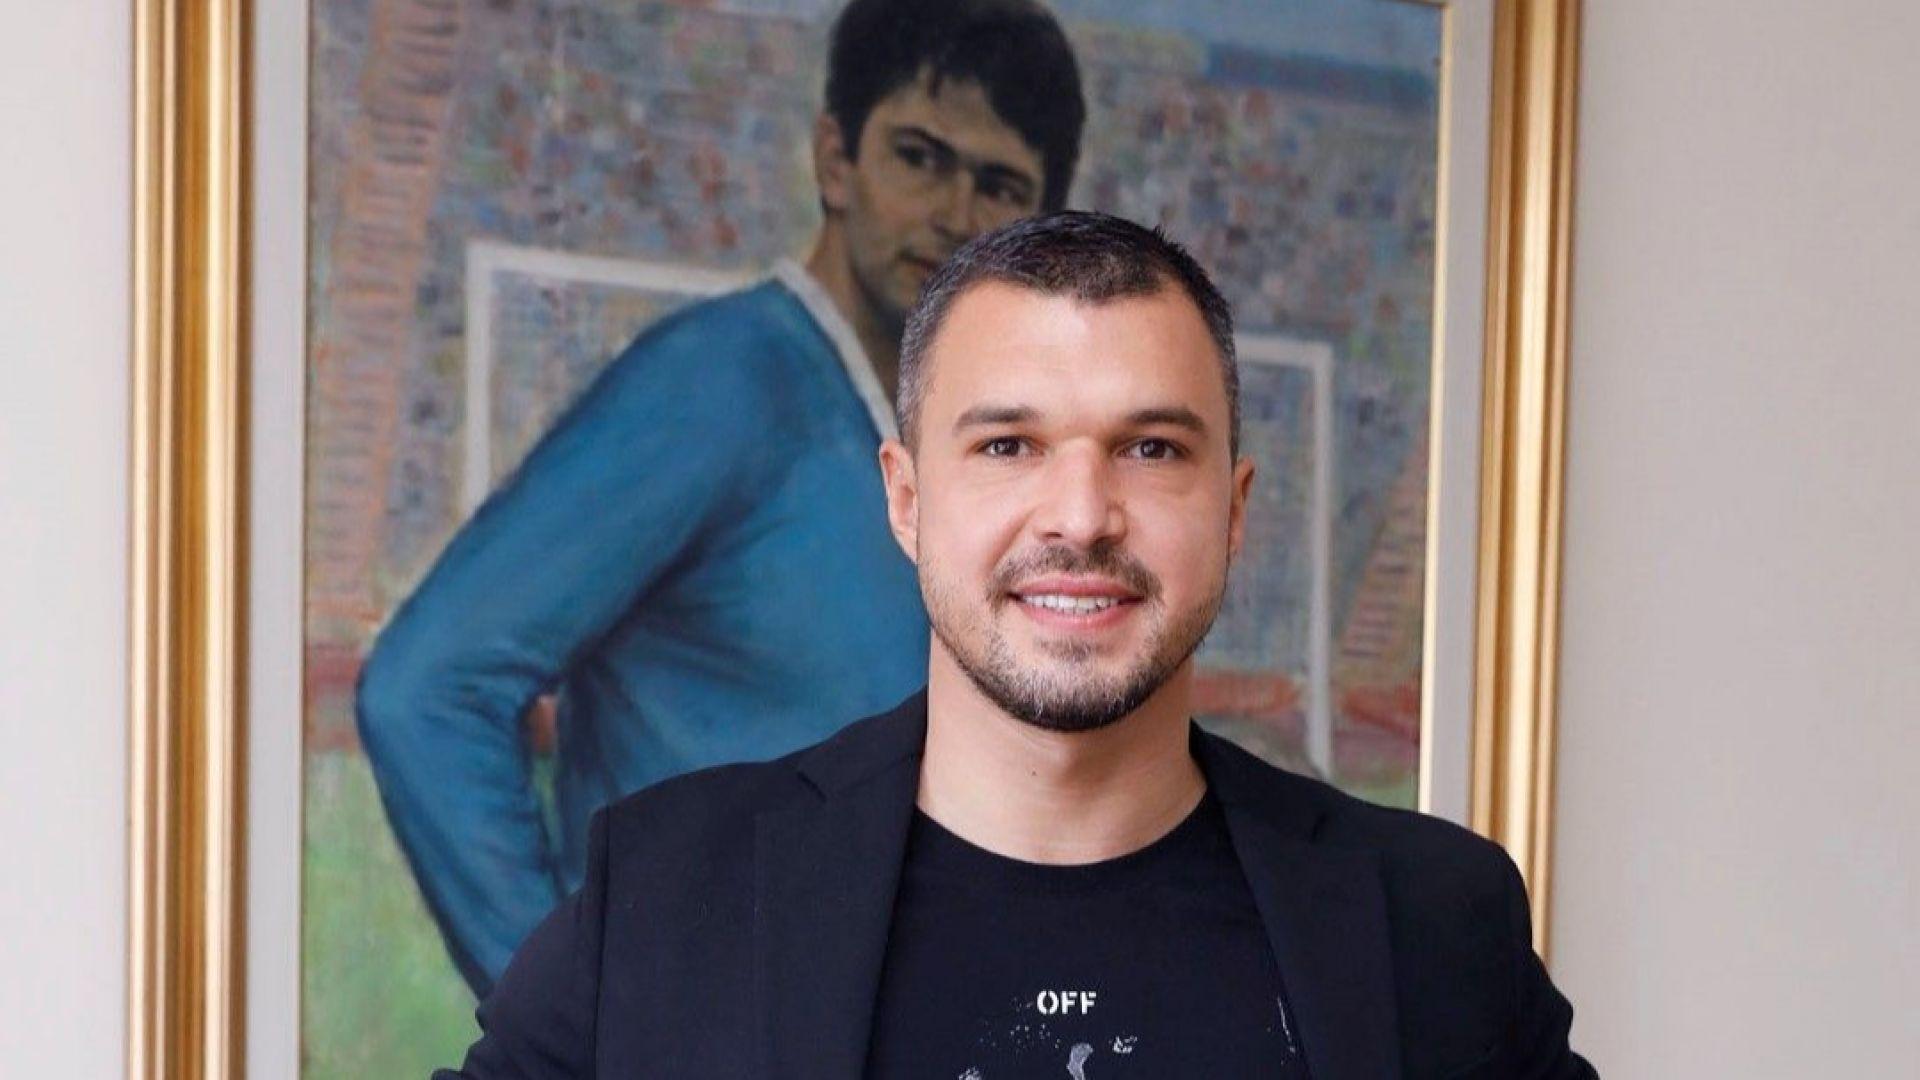 Божинов подписа и позира със синия екип